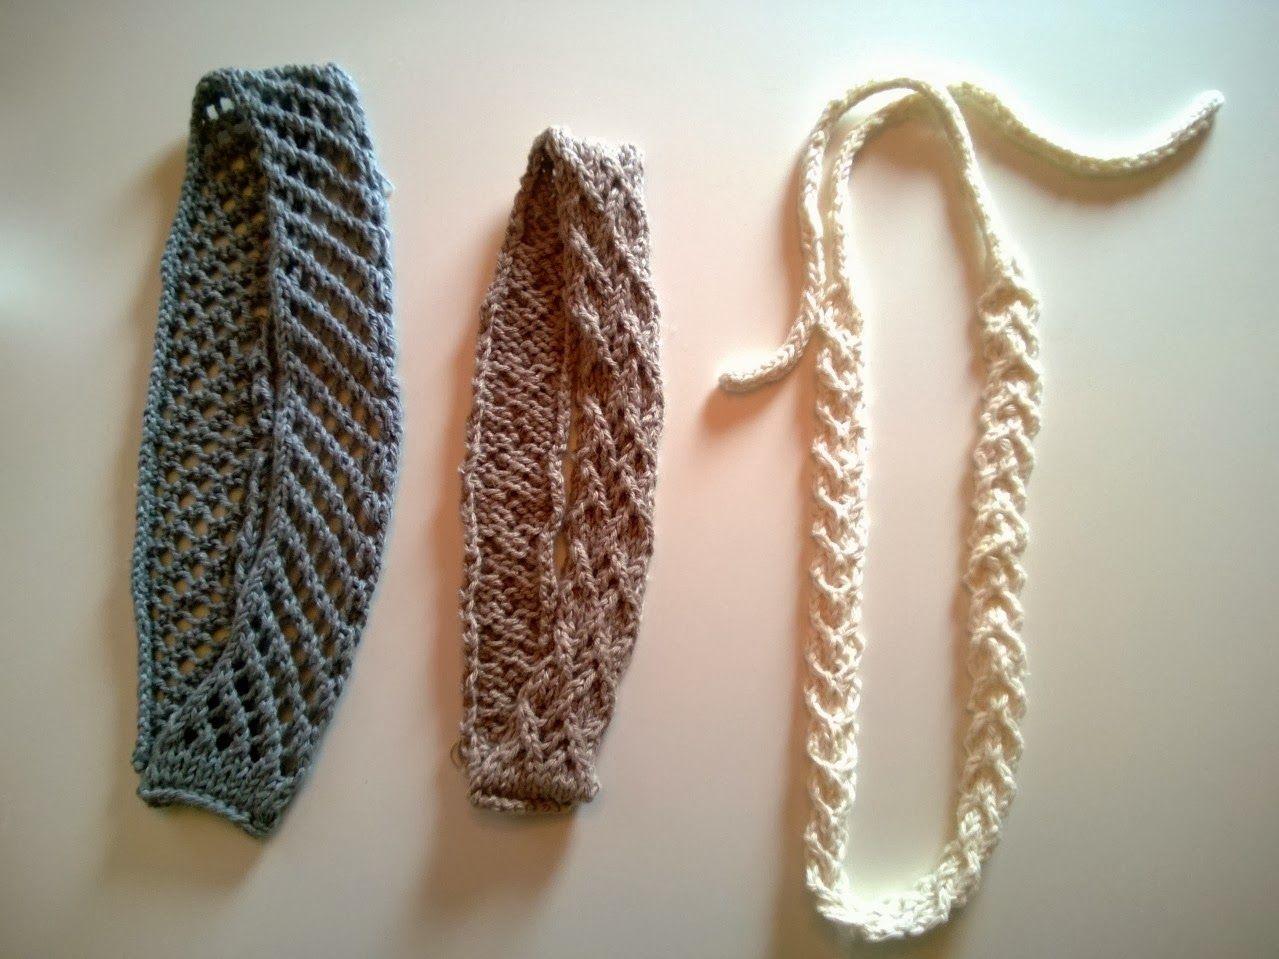 Katri Knits: Neulotut jämälanka hiuspannat *Knitted leftover yarn headbands*